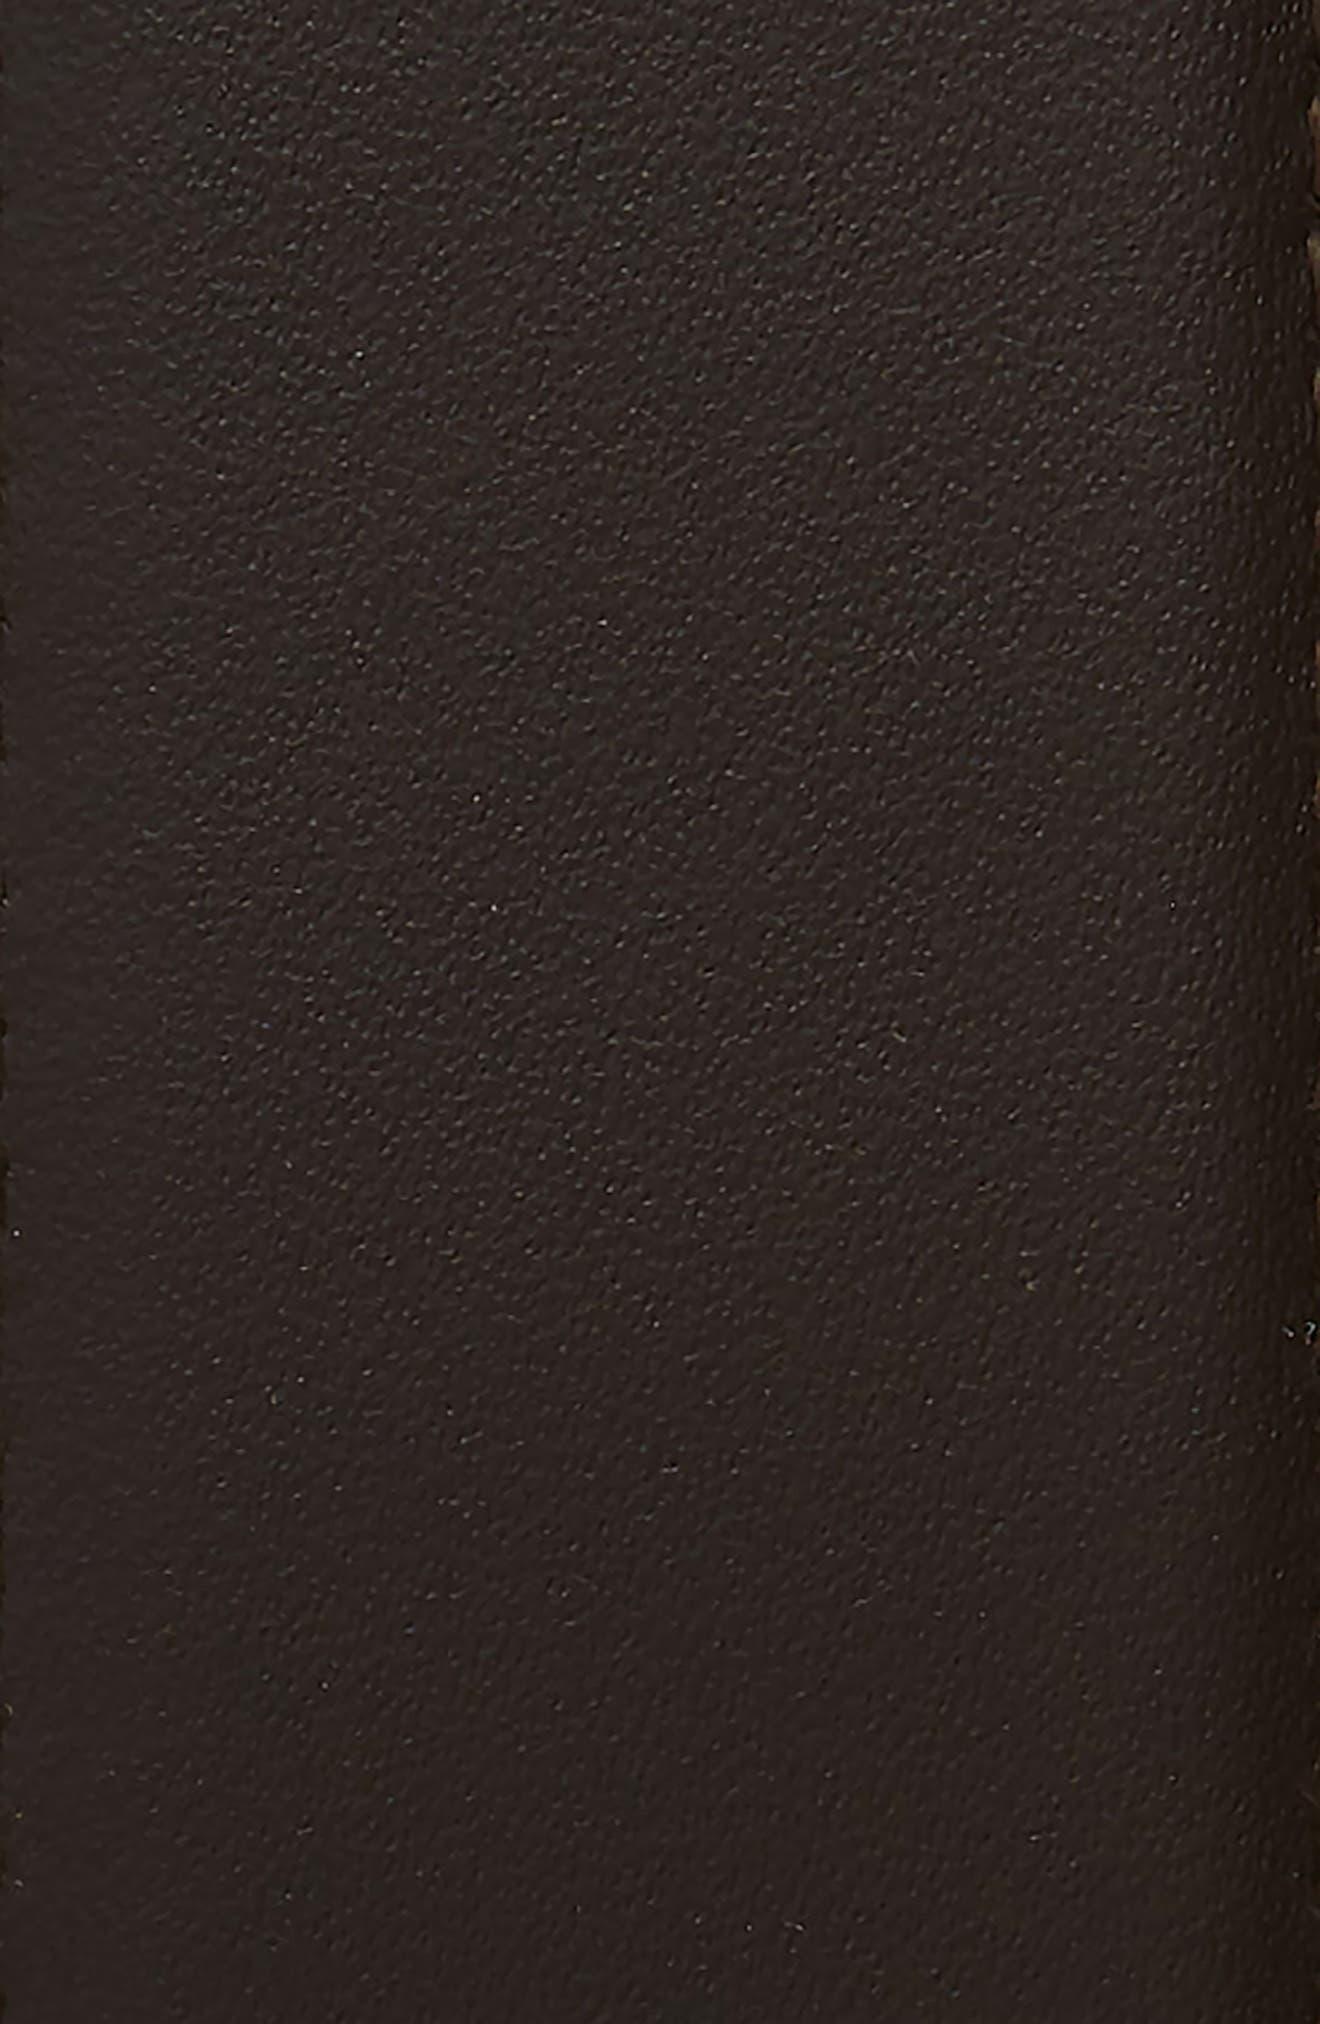 SALVATORE FERRAGAMO,                             Leather Belt,                             Alternate thumbnail 3, color,                             HICKORY/ NERO